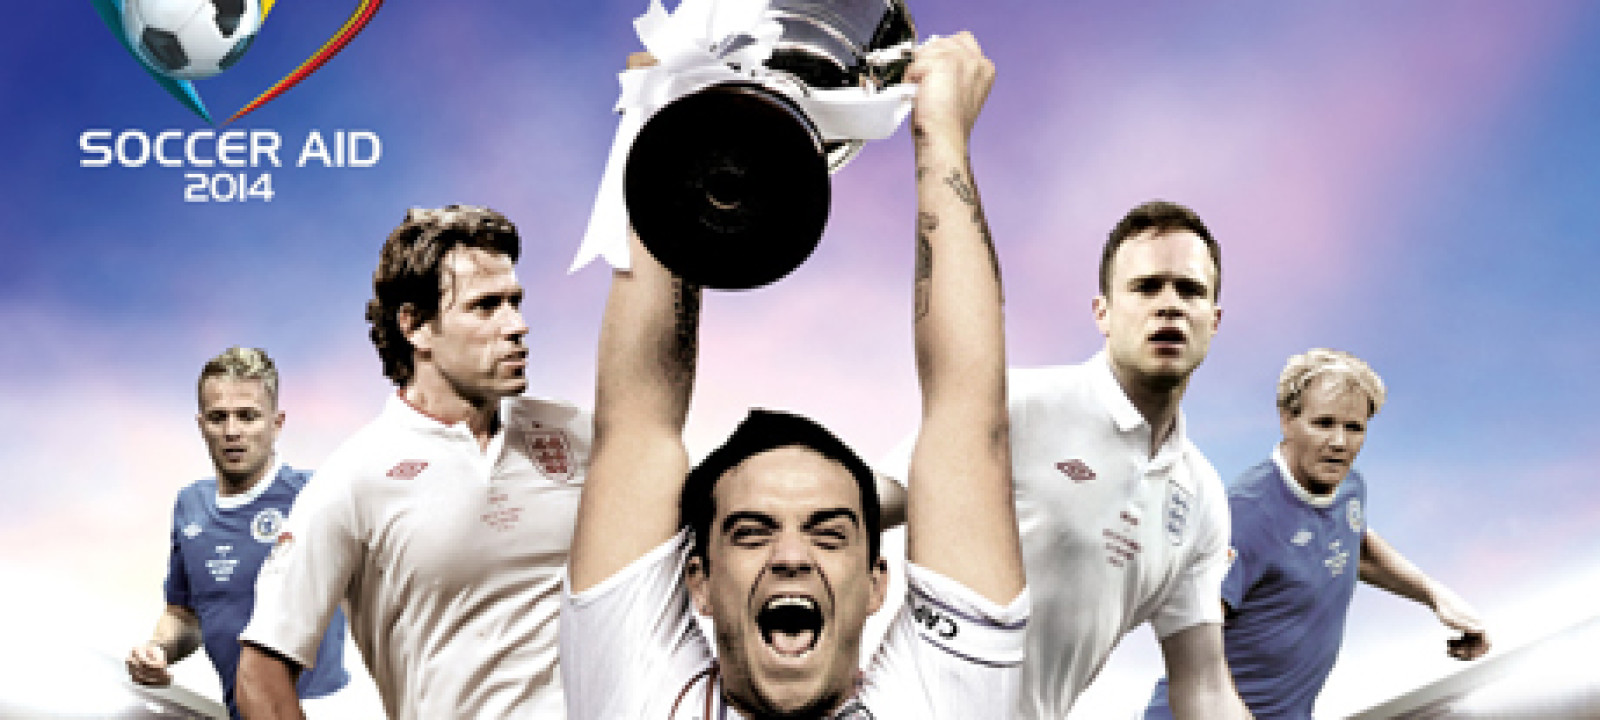 Soccer Aid 2014